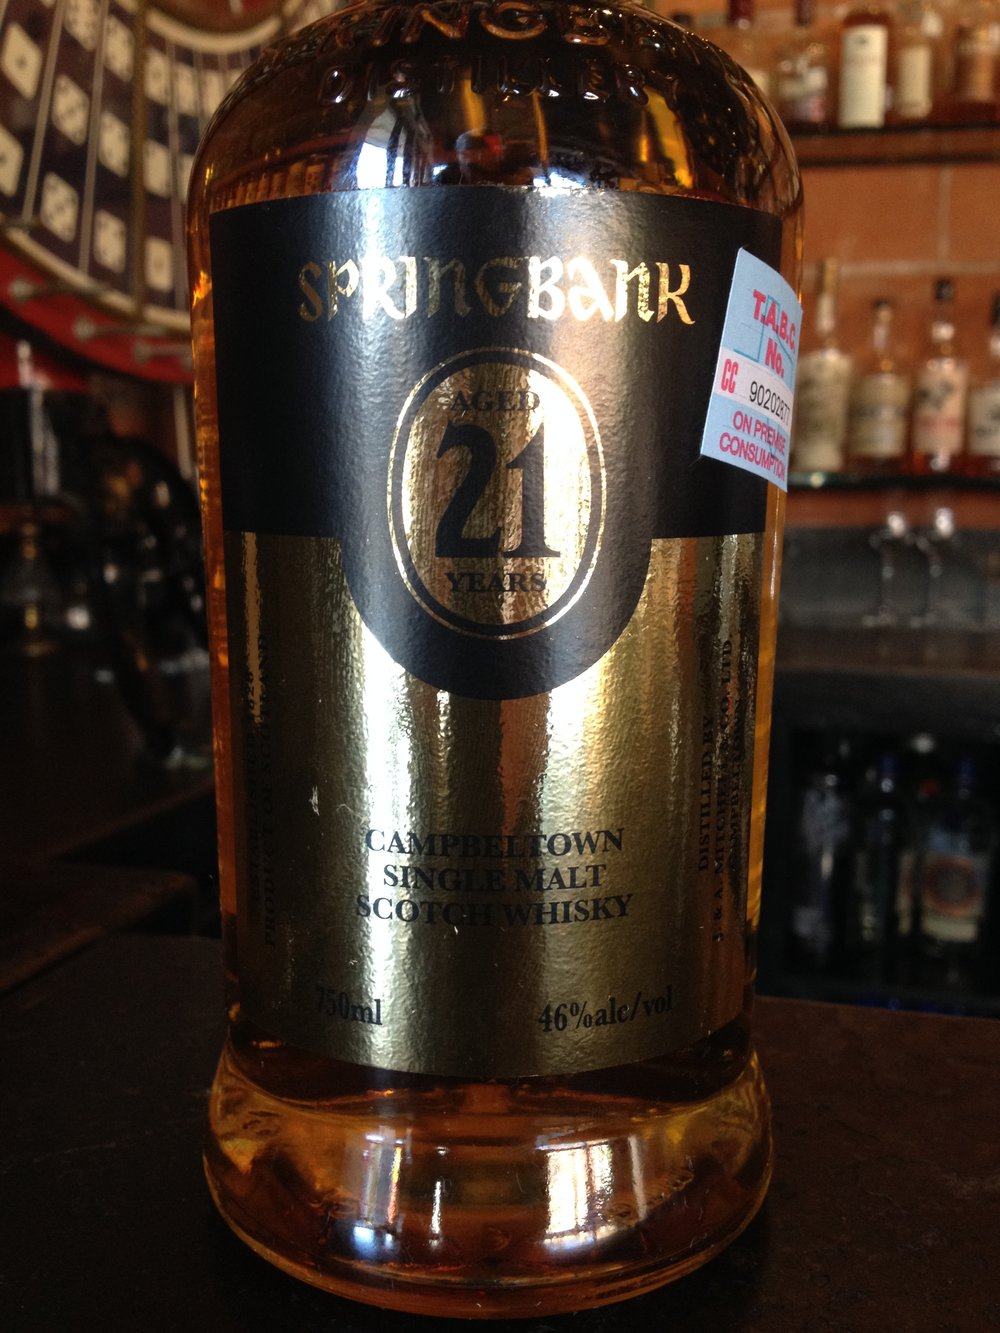 21 Year Old | 46% ABV - Distillery | Springbank